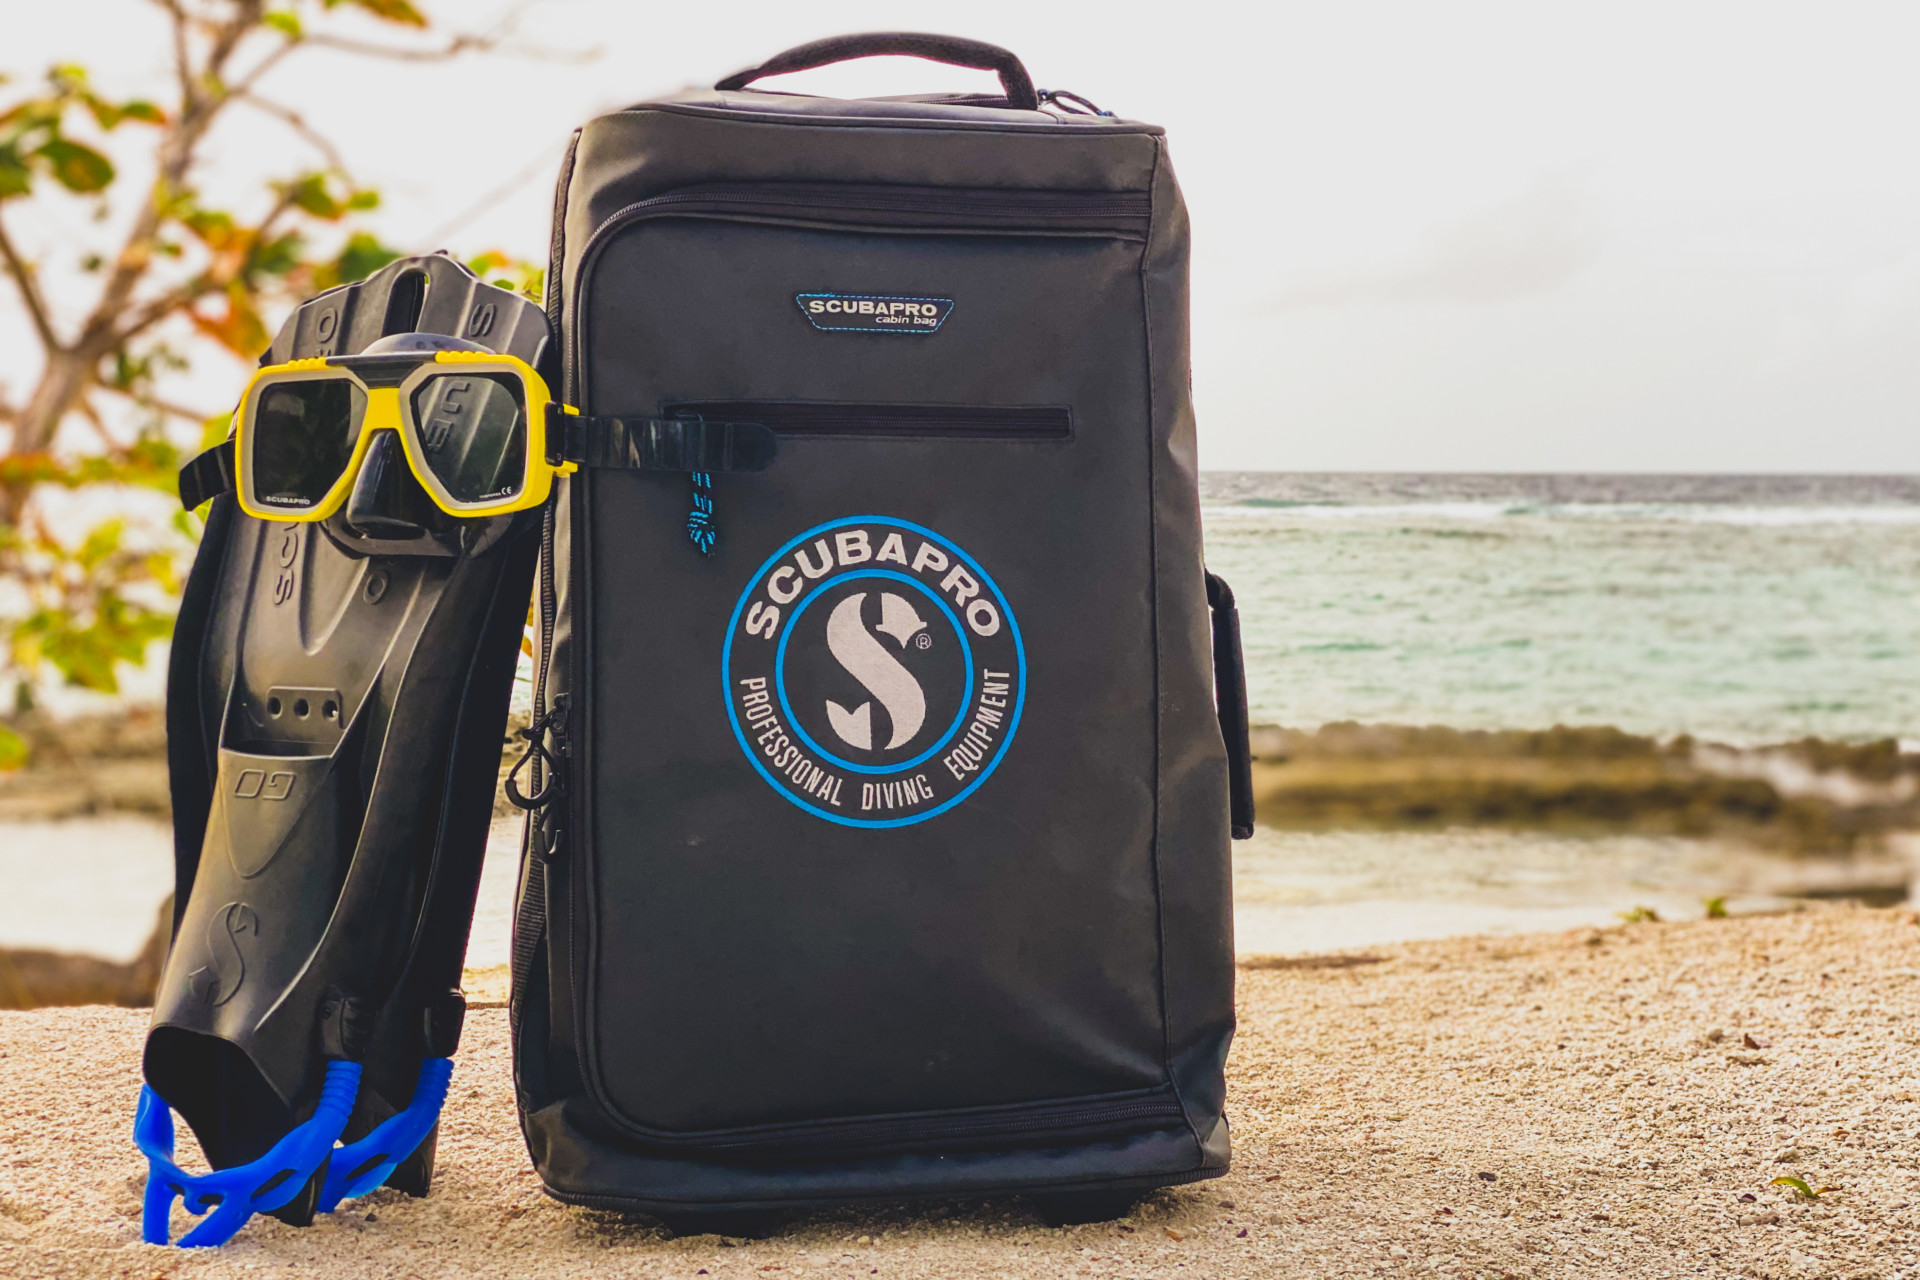 scubapro luggage at the beach in maldives